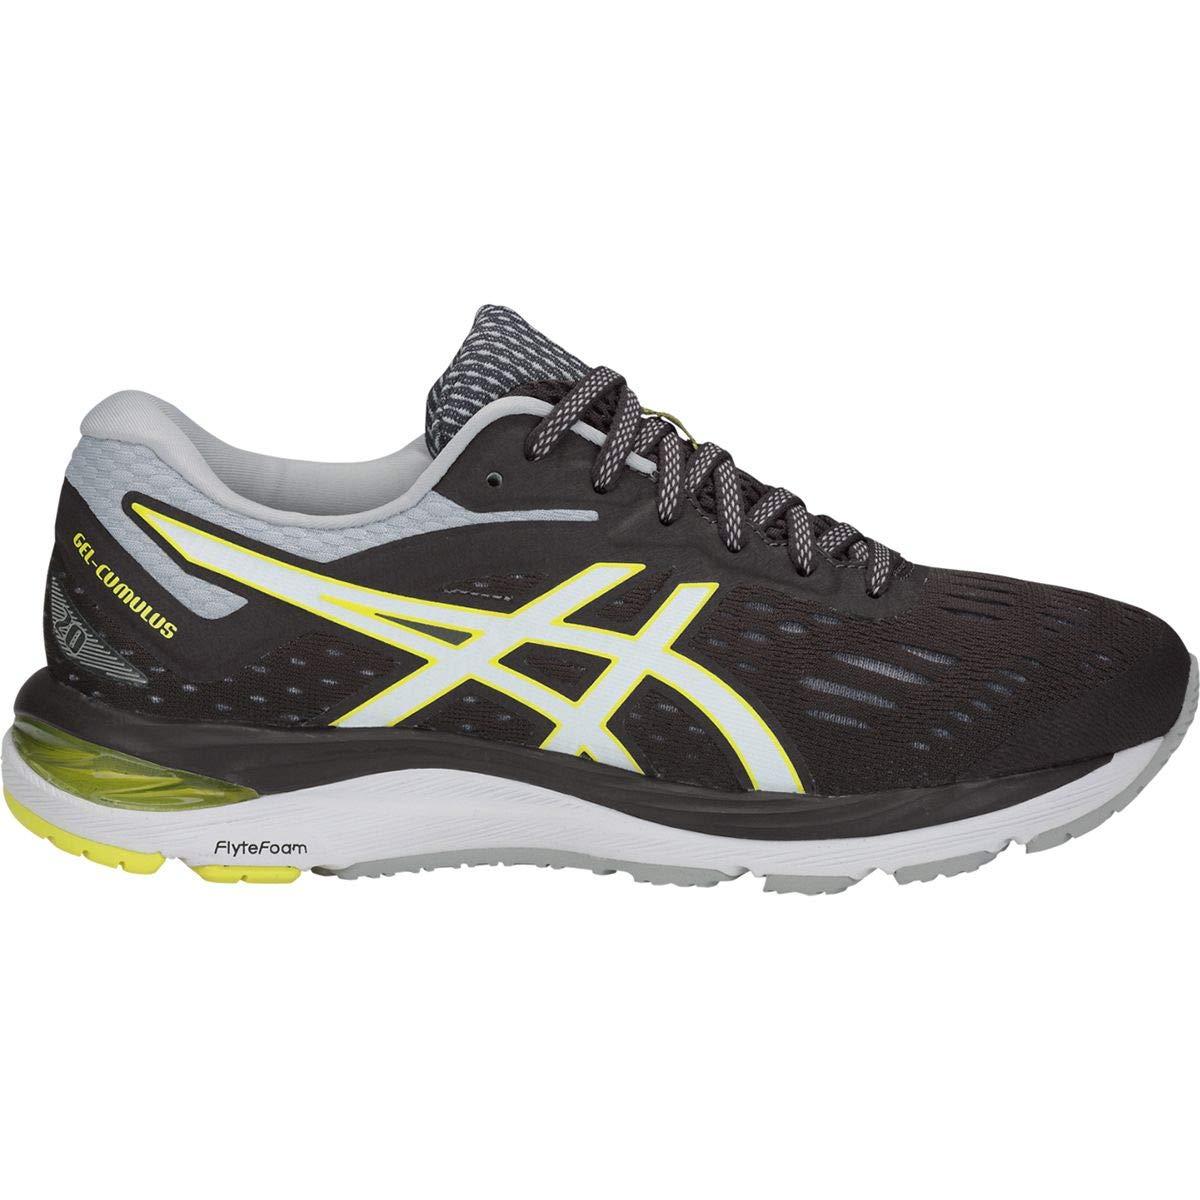 【GINGER掲載商品】 [アシックス] レディース ランニング 20 Gel-Cumulus 10 20 Running Shoe レディース [並行輸入品] B07MTBTT65 10, 雑貨屋よしい:a1567328 --- beutycity.com